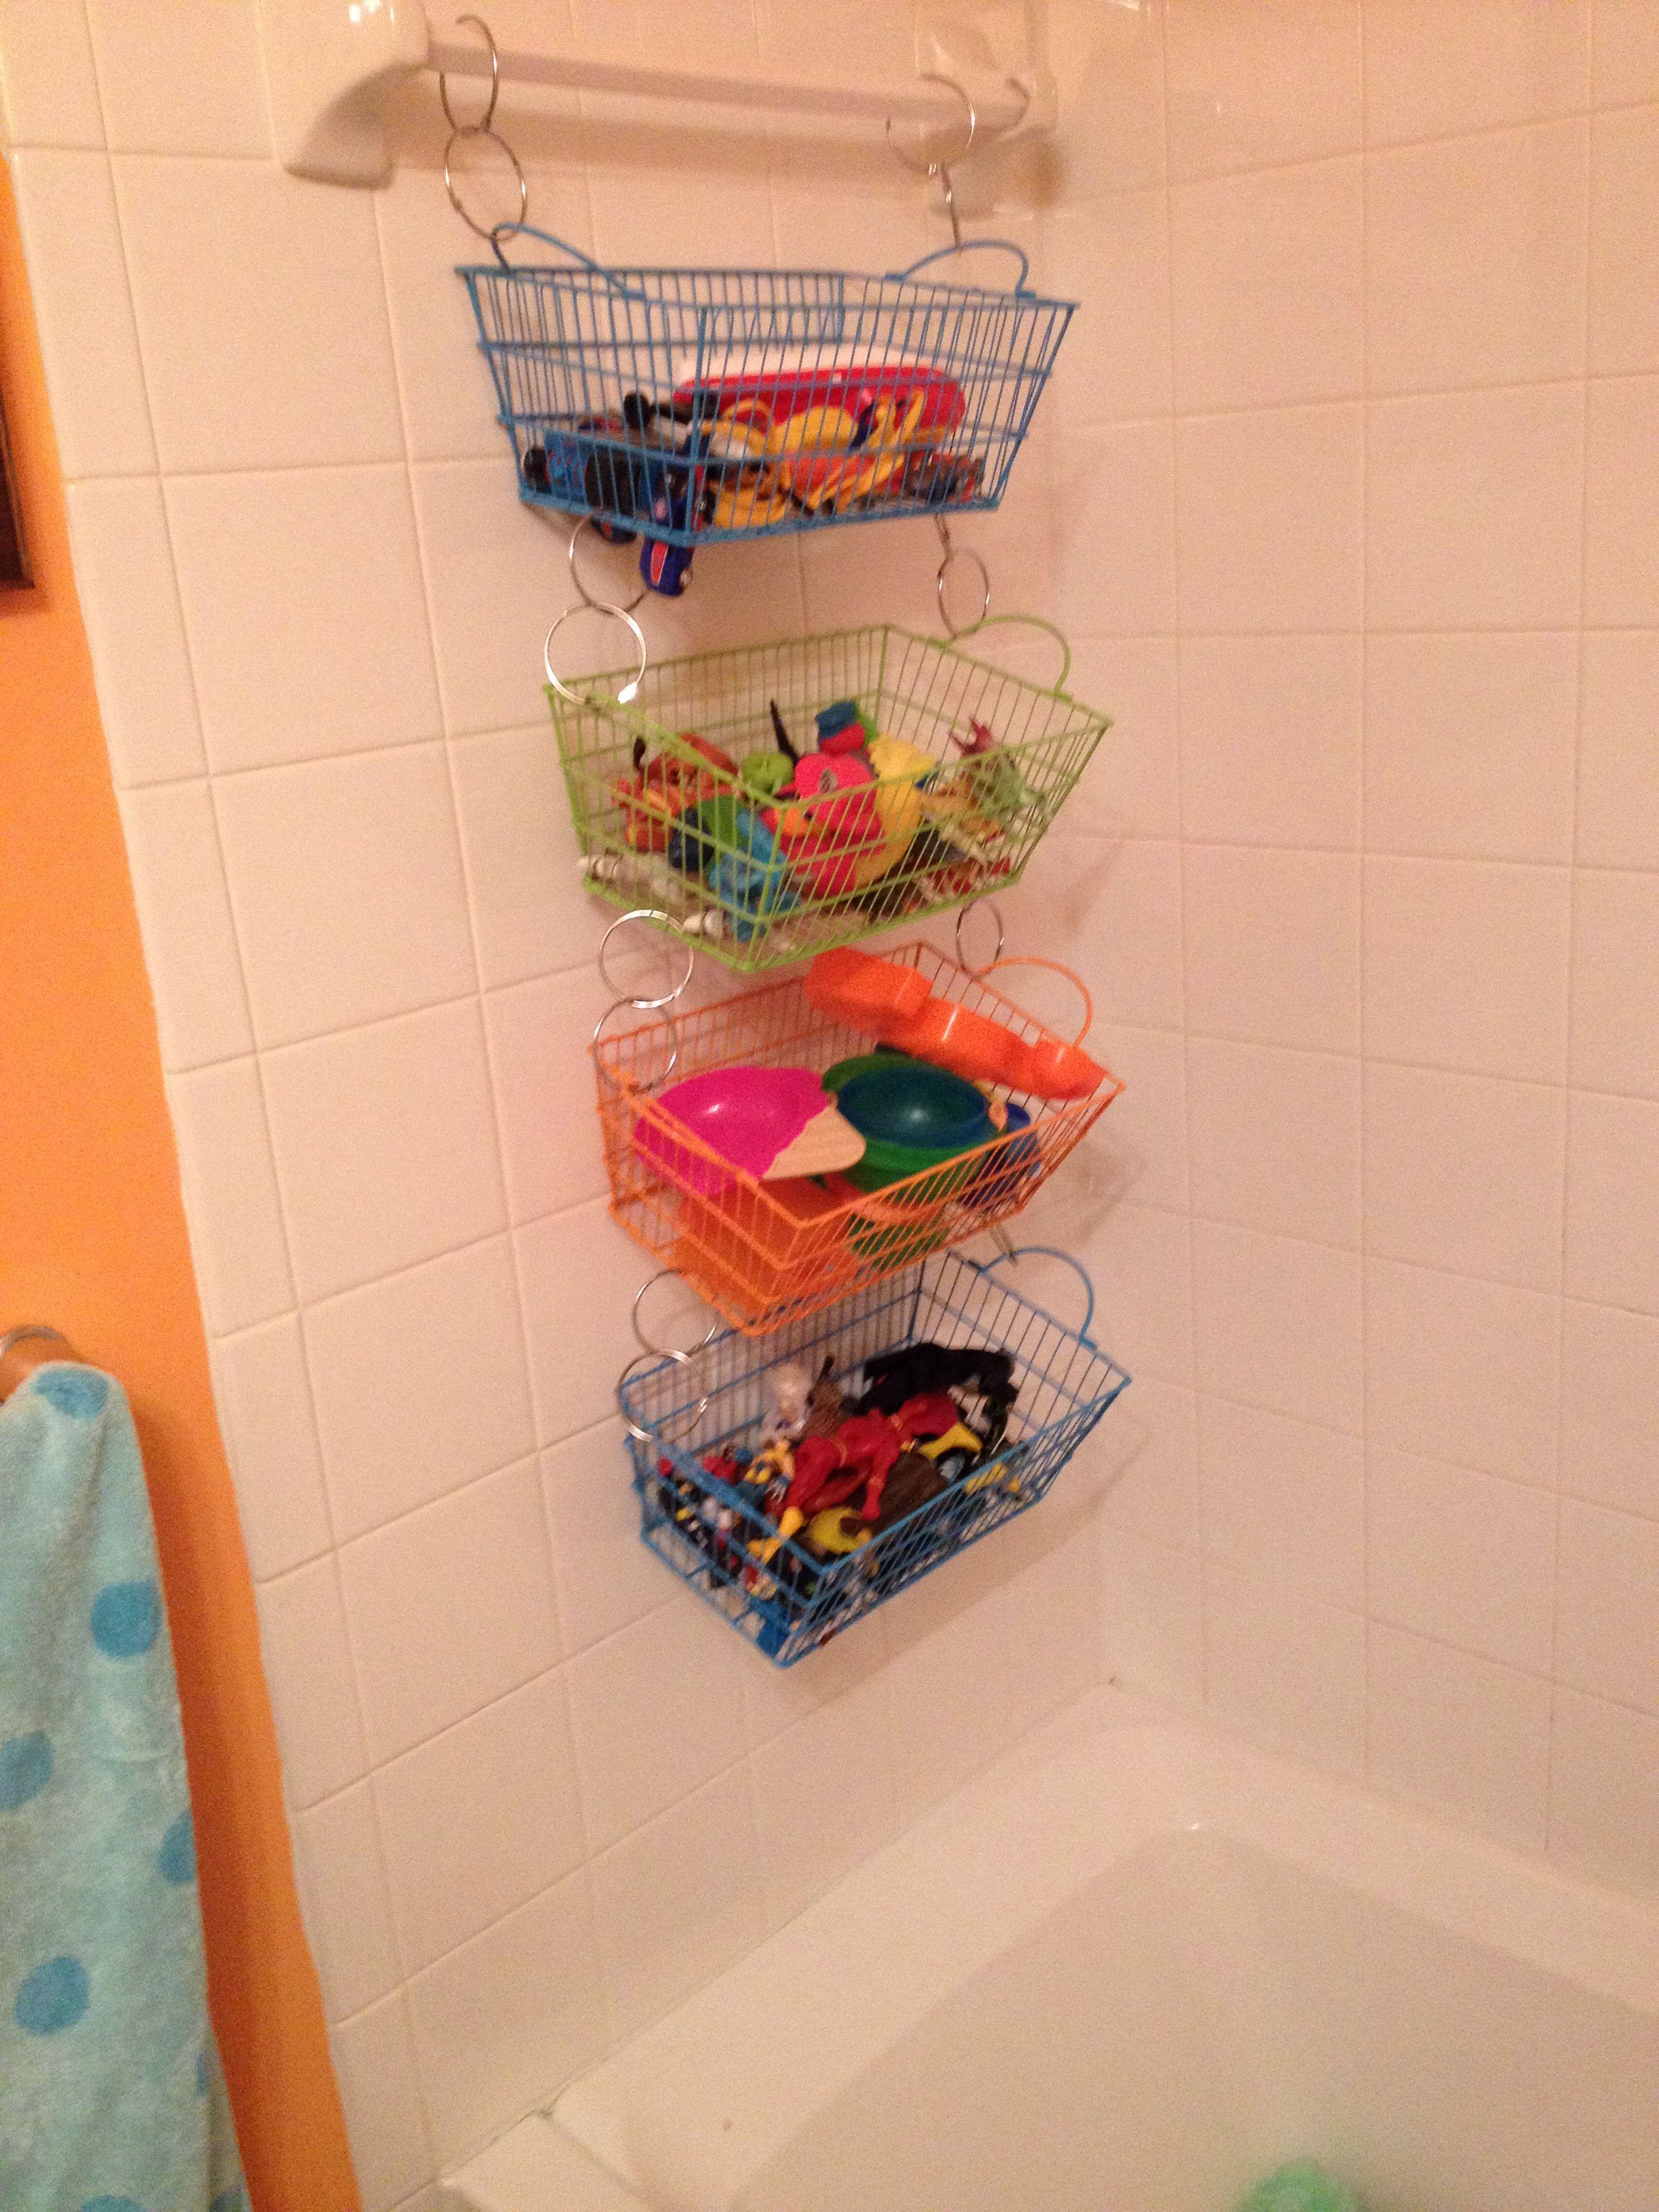 Tub toy organization rubbercoated baskets from below u metal